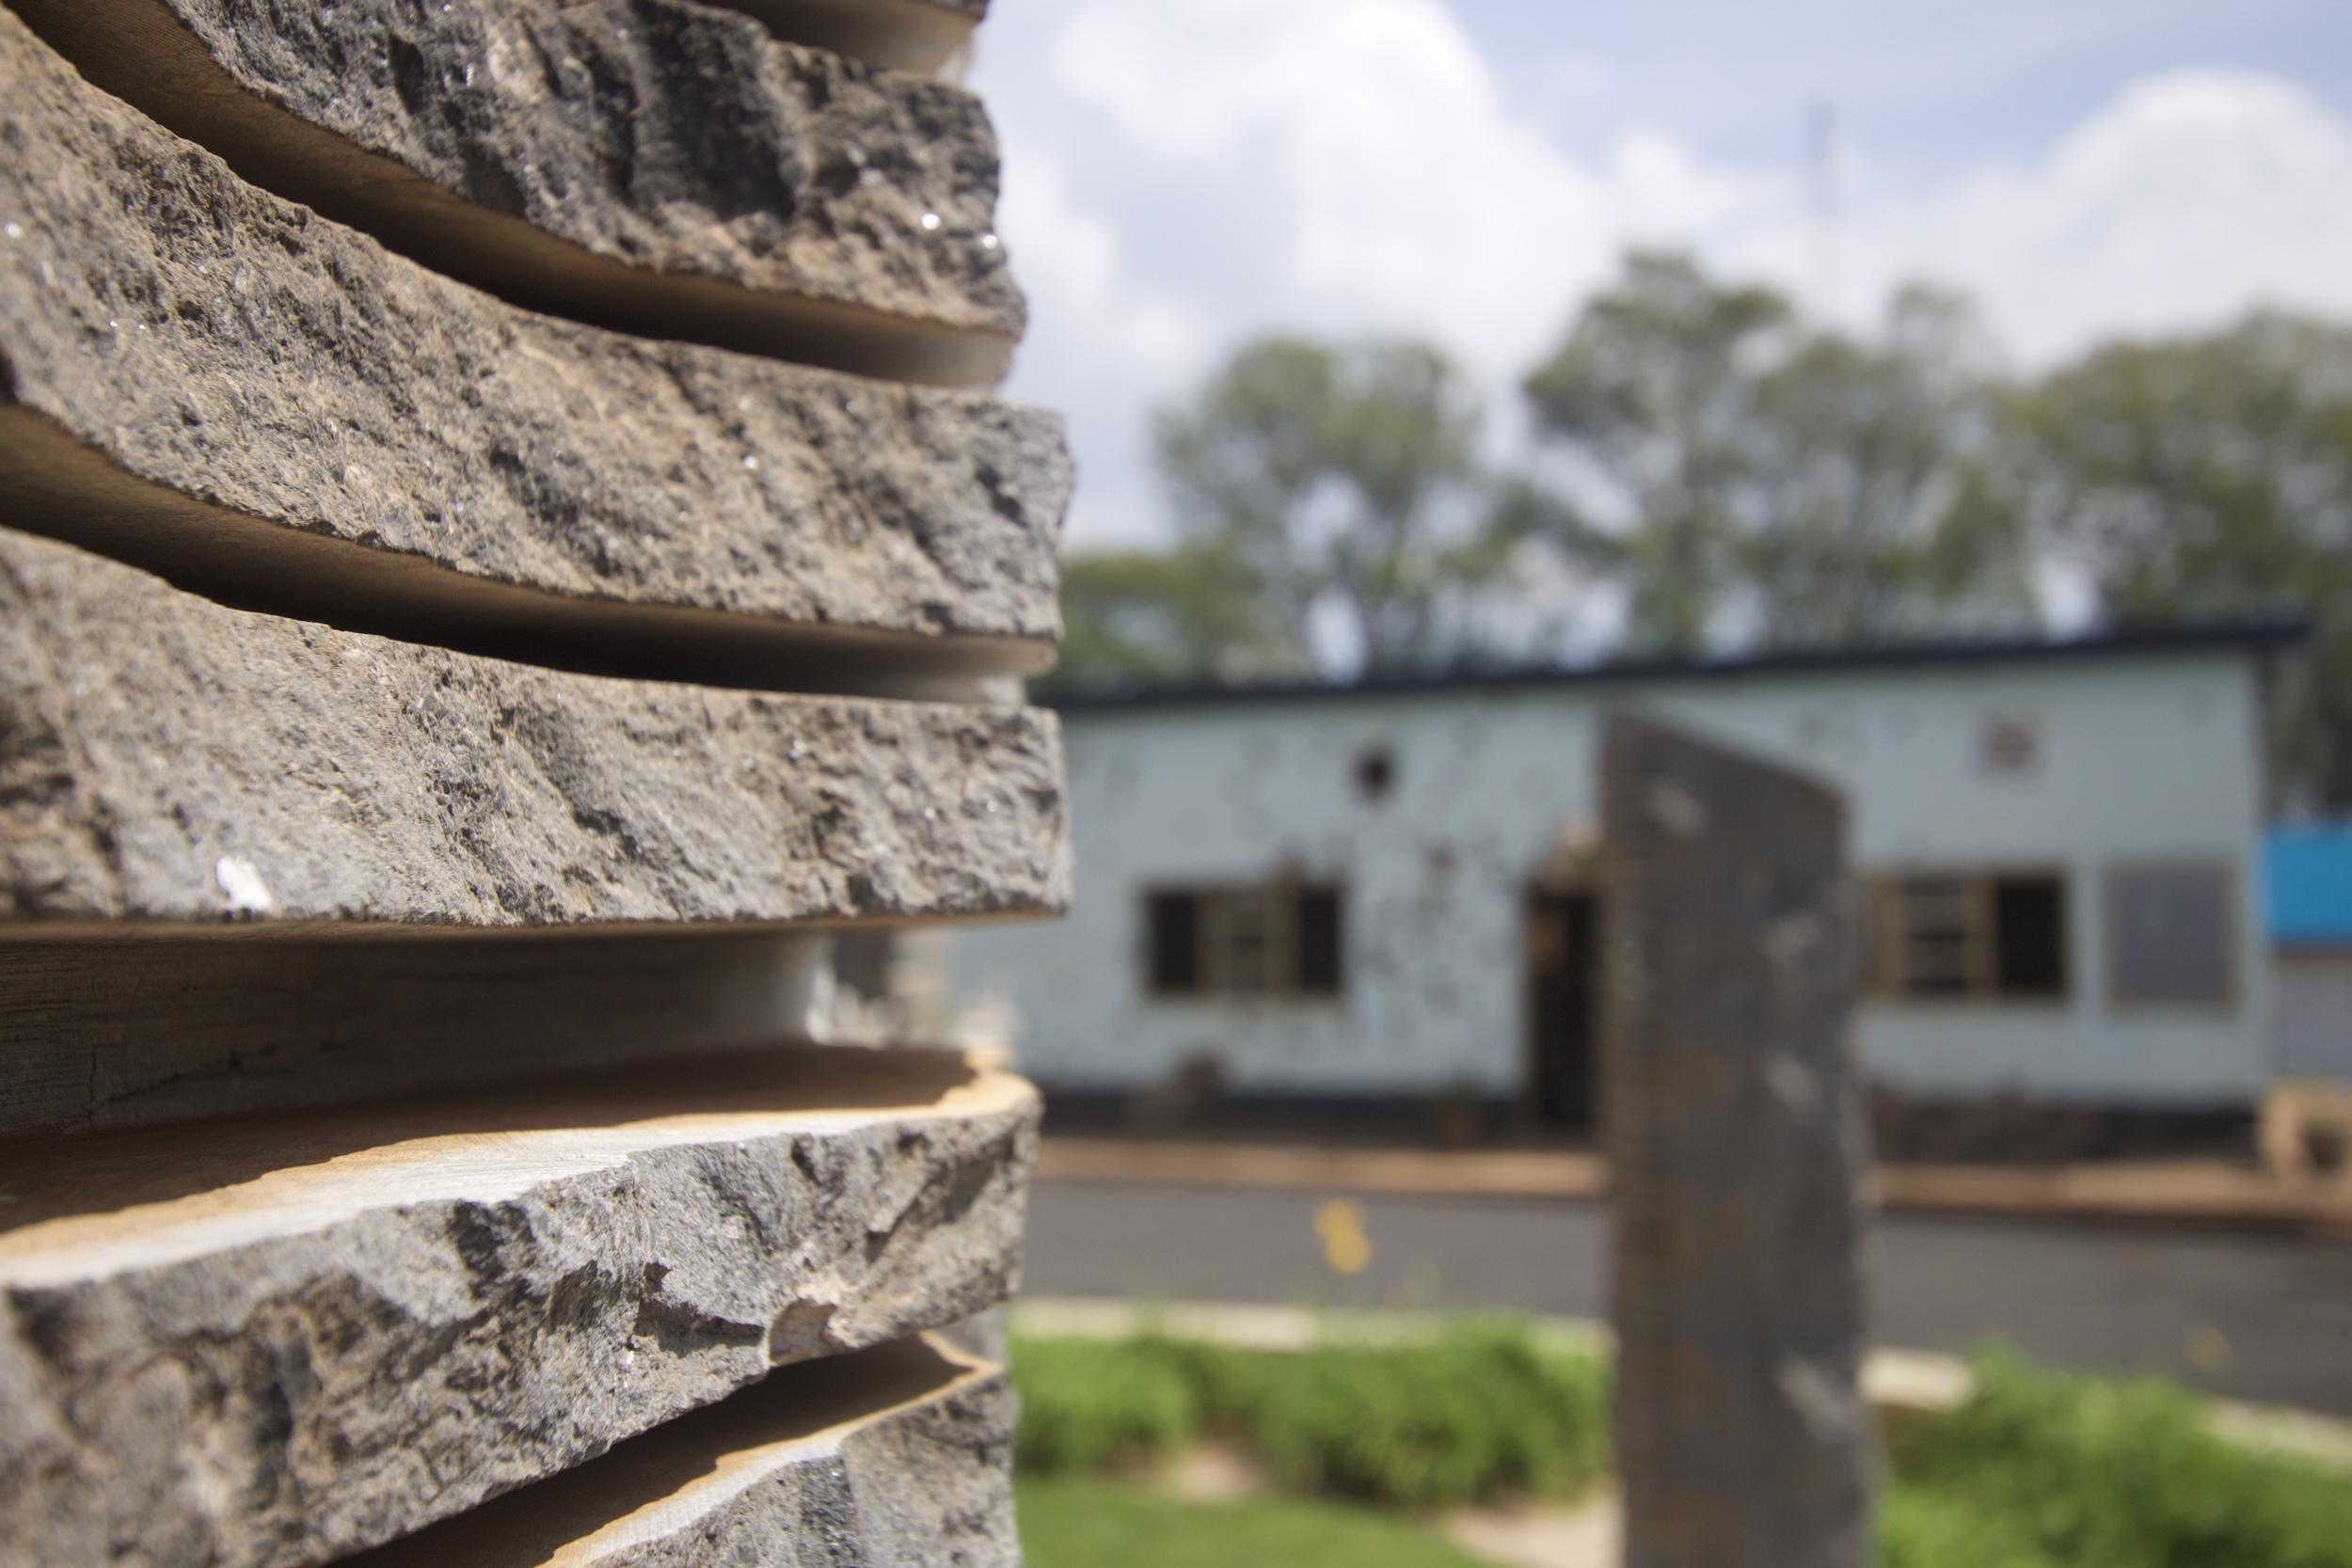 UN Peacekeeper Memorial, Kigali